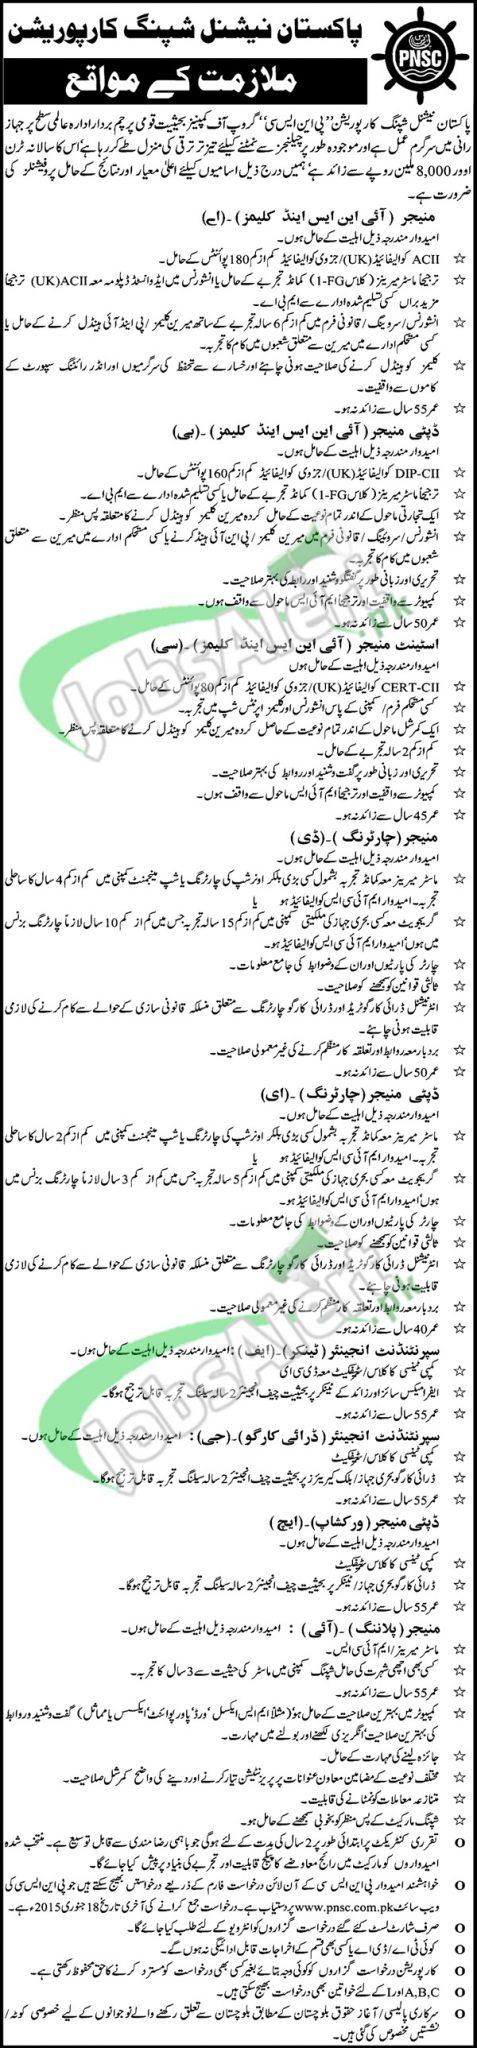 PNSC Karachi